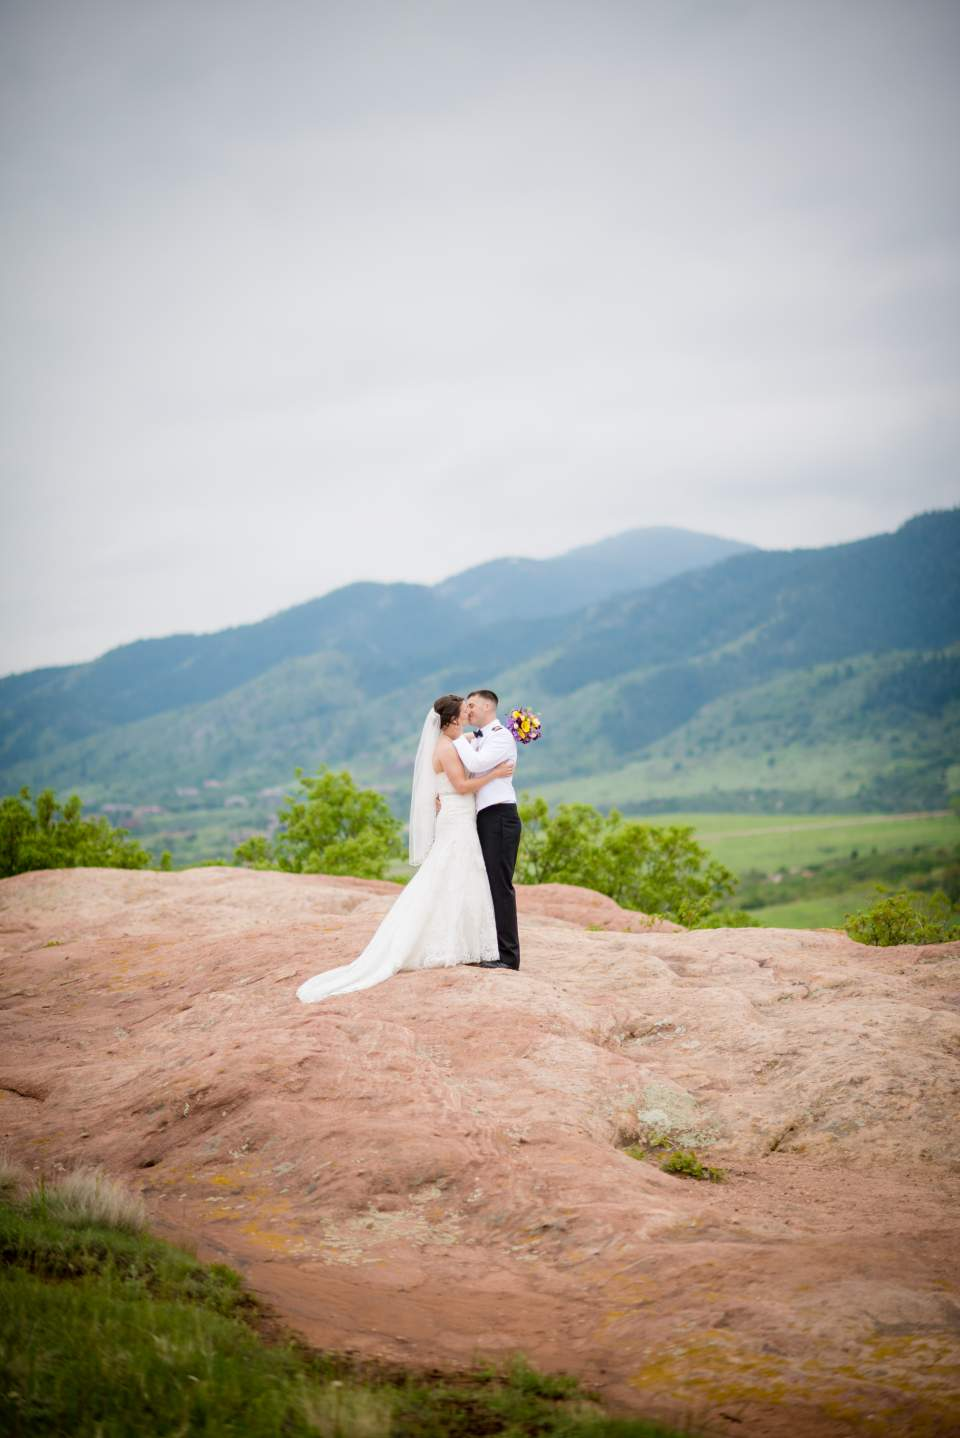 wedding photos at south valley park in ken caryl